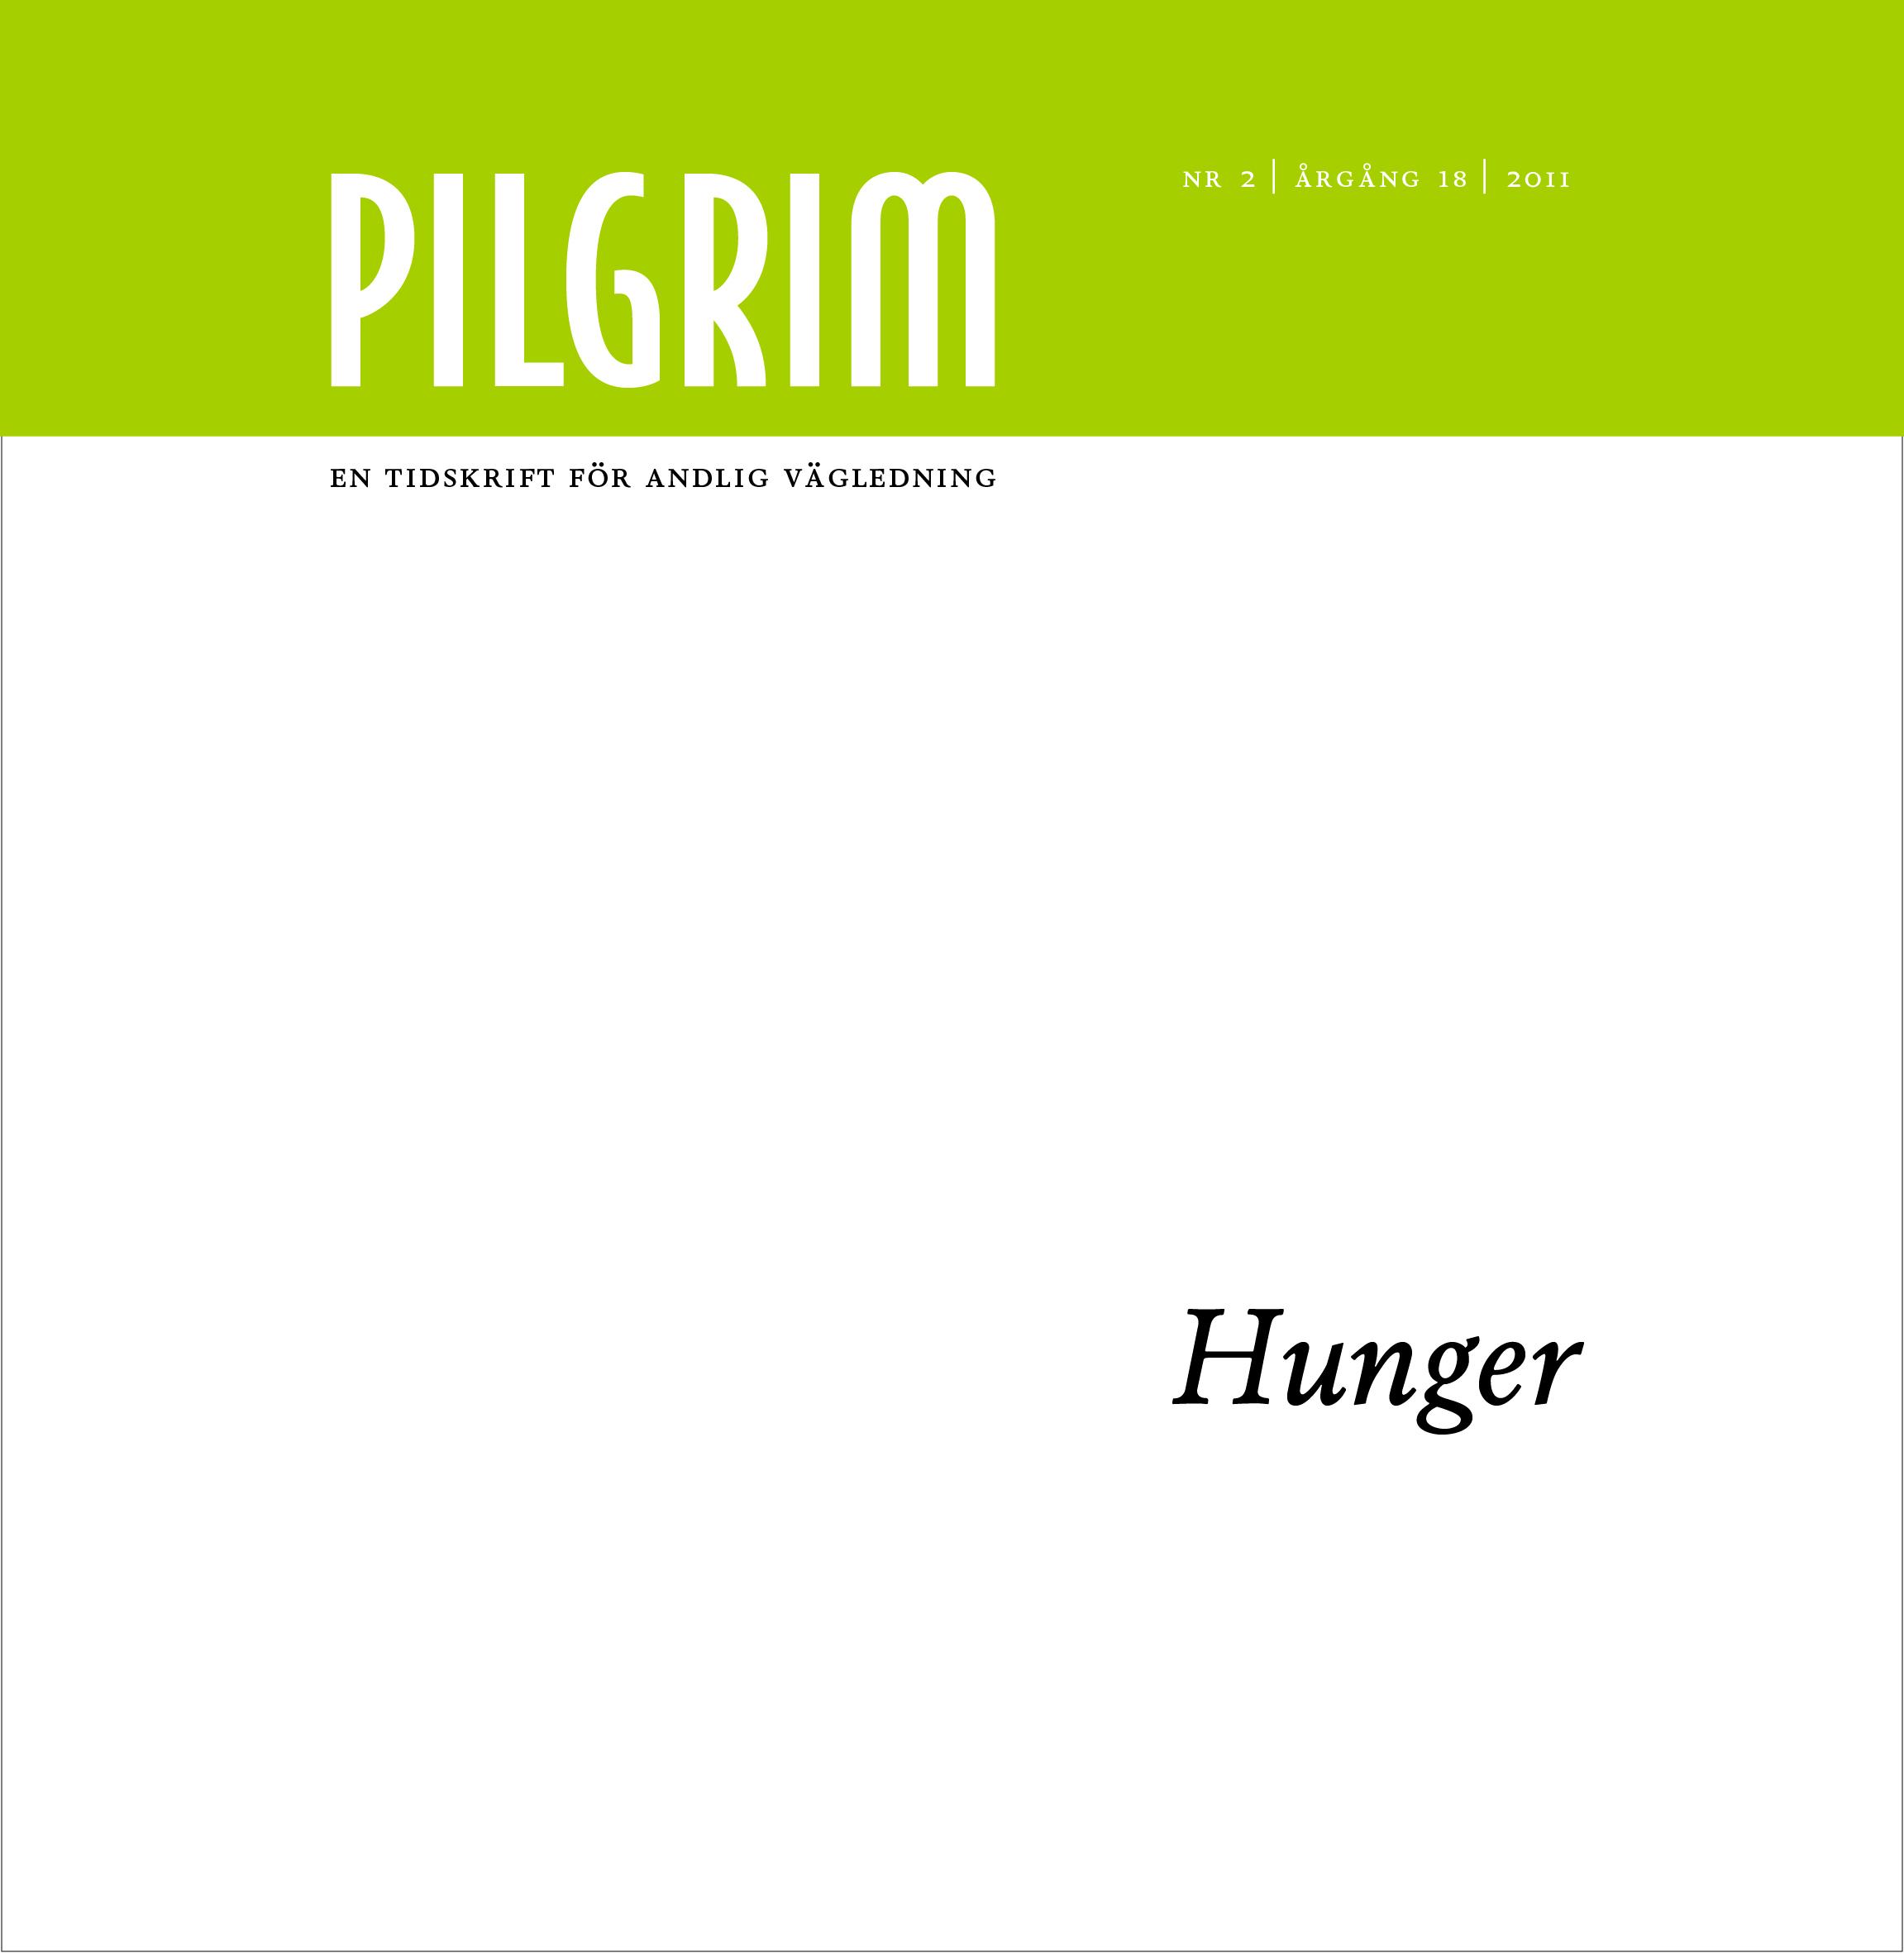 Pilgrim frams 2011-2